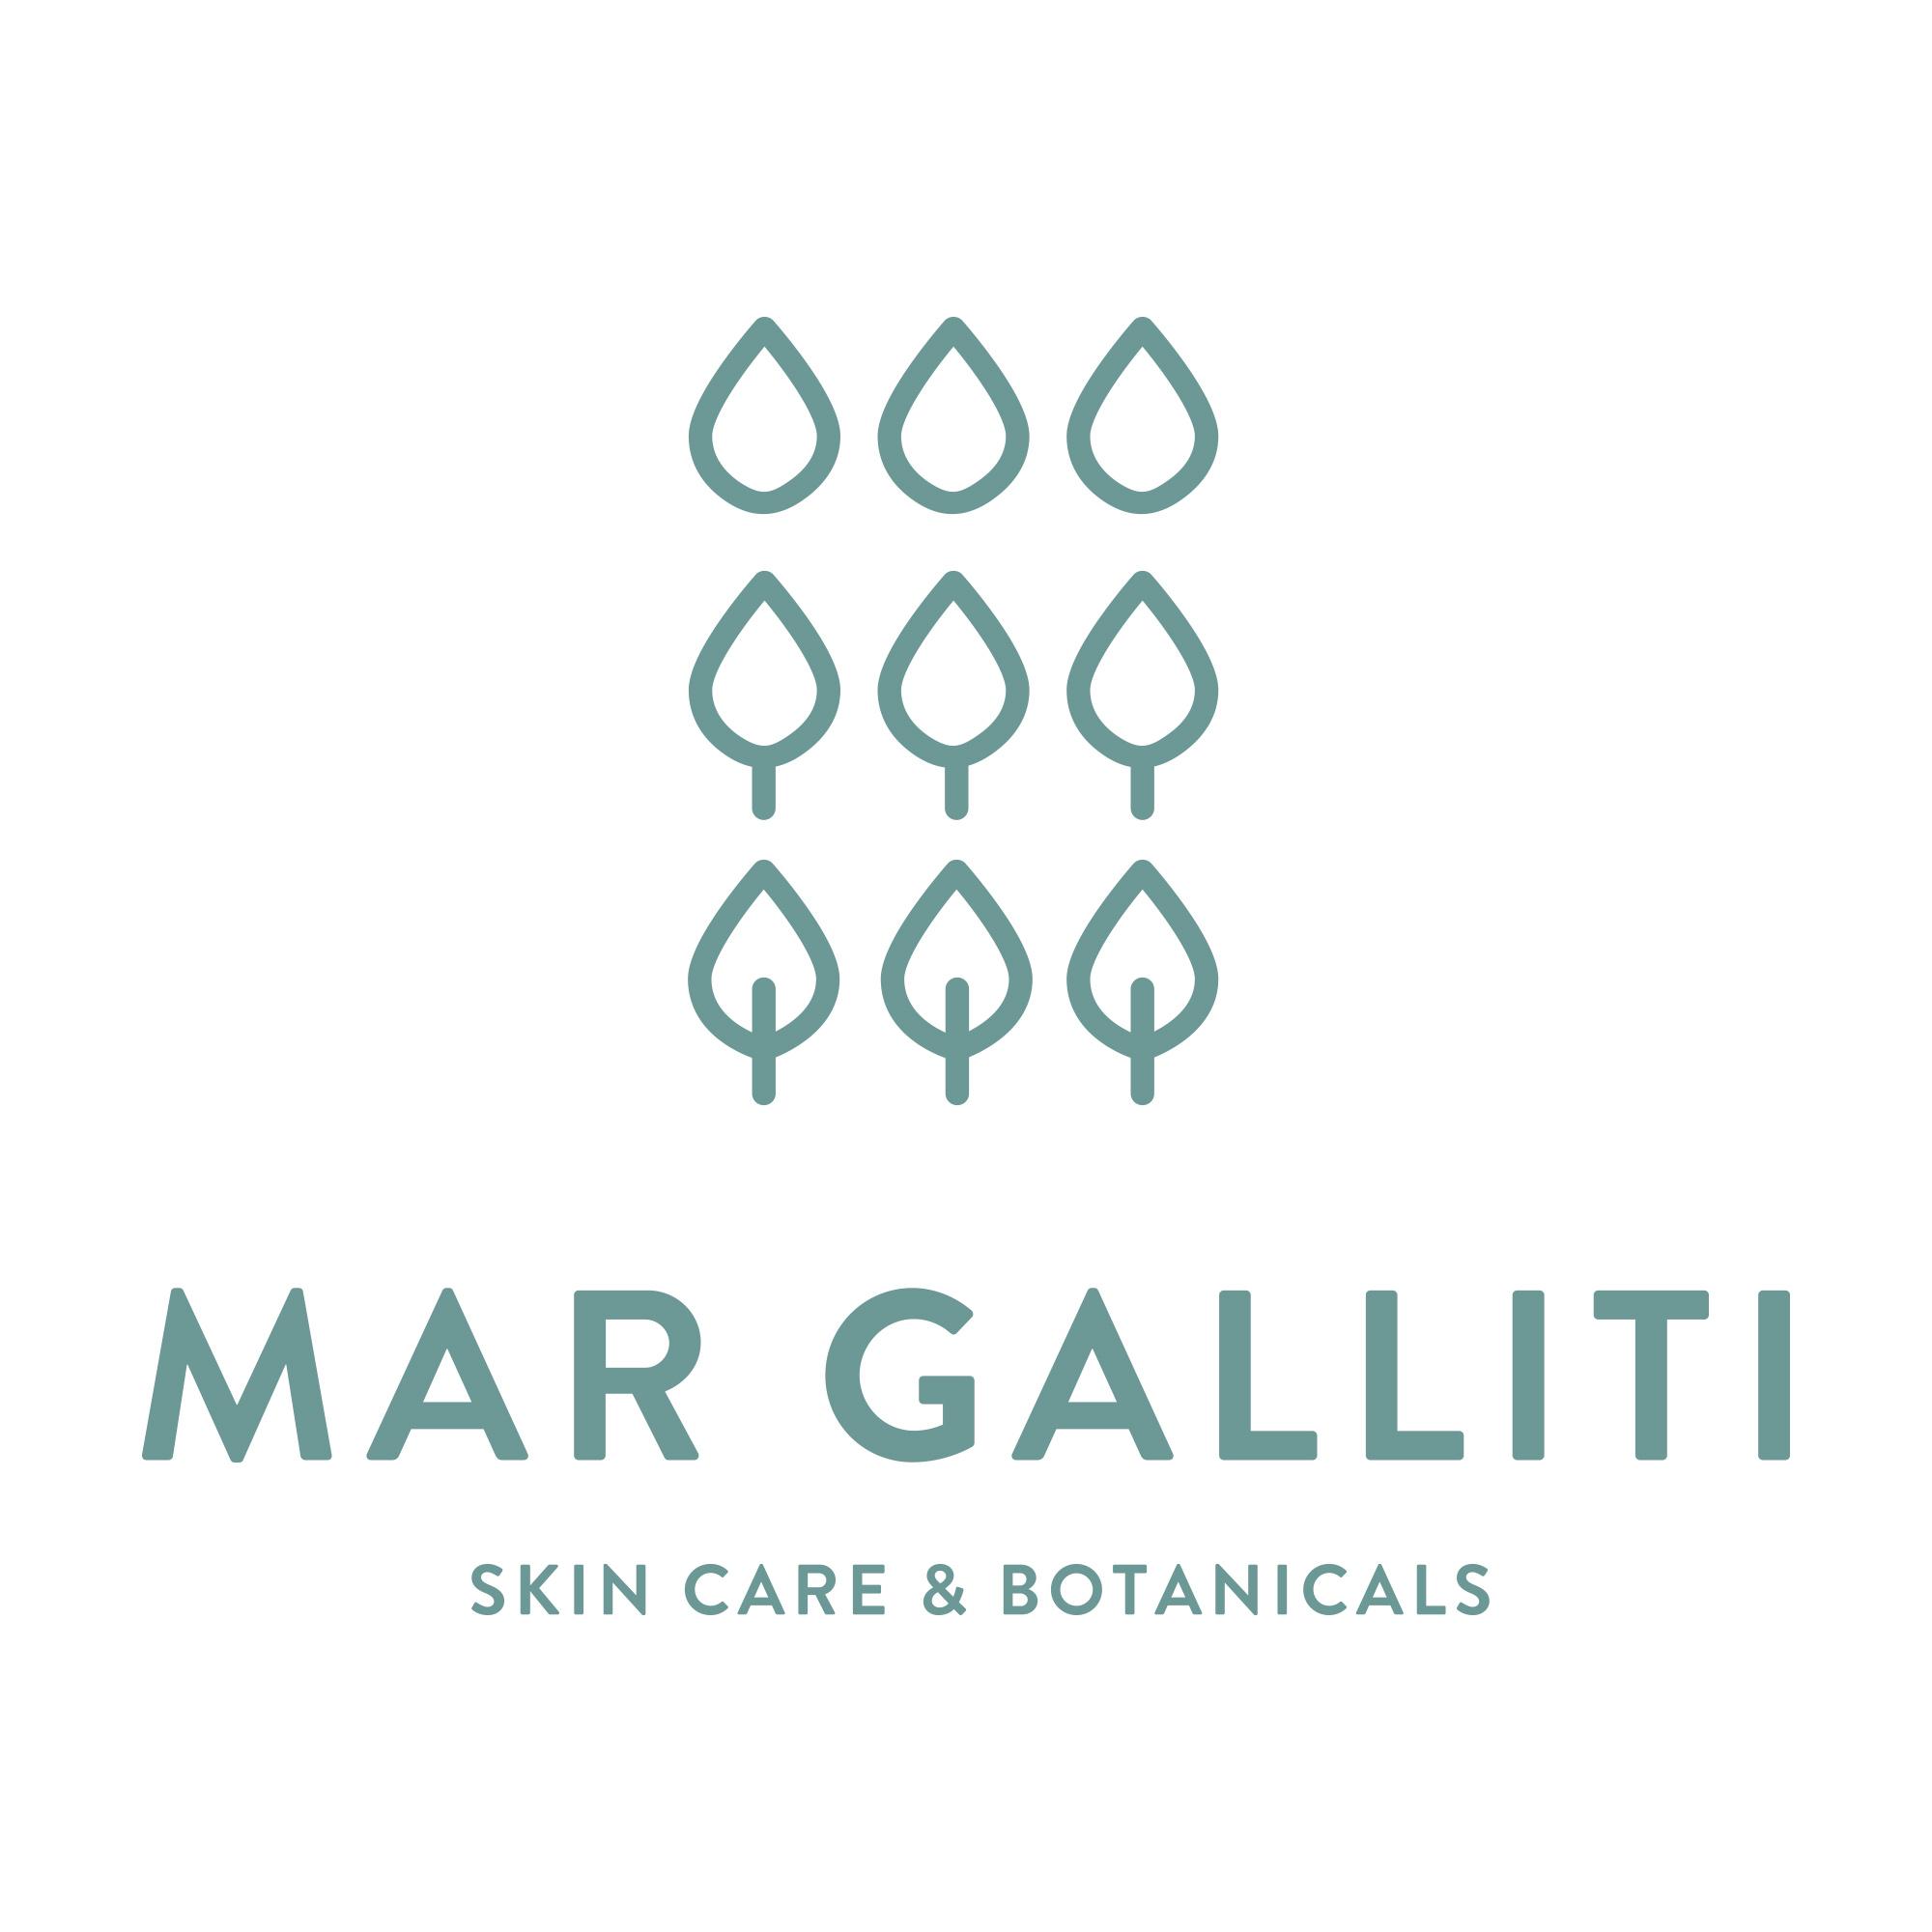 Mar Galliti logo